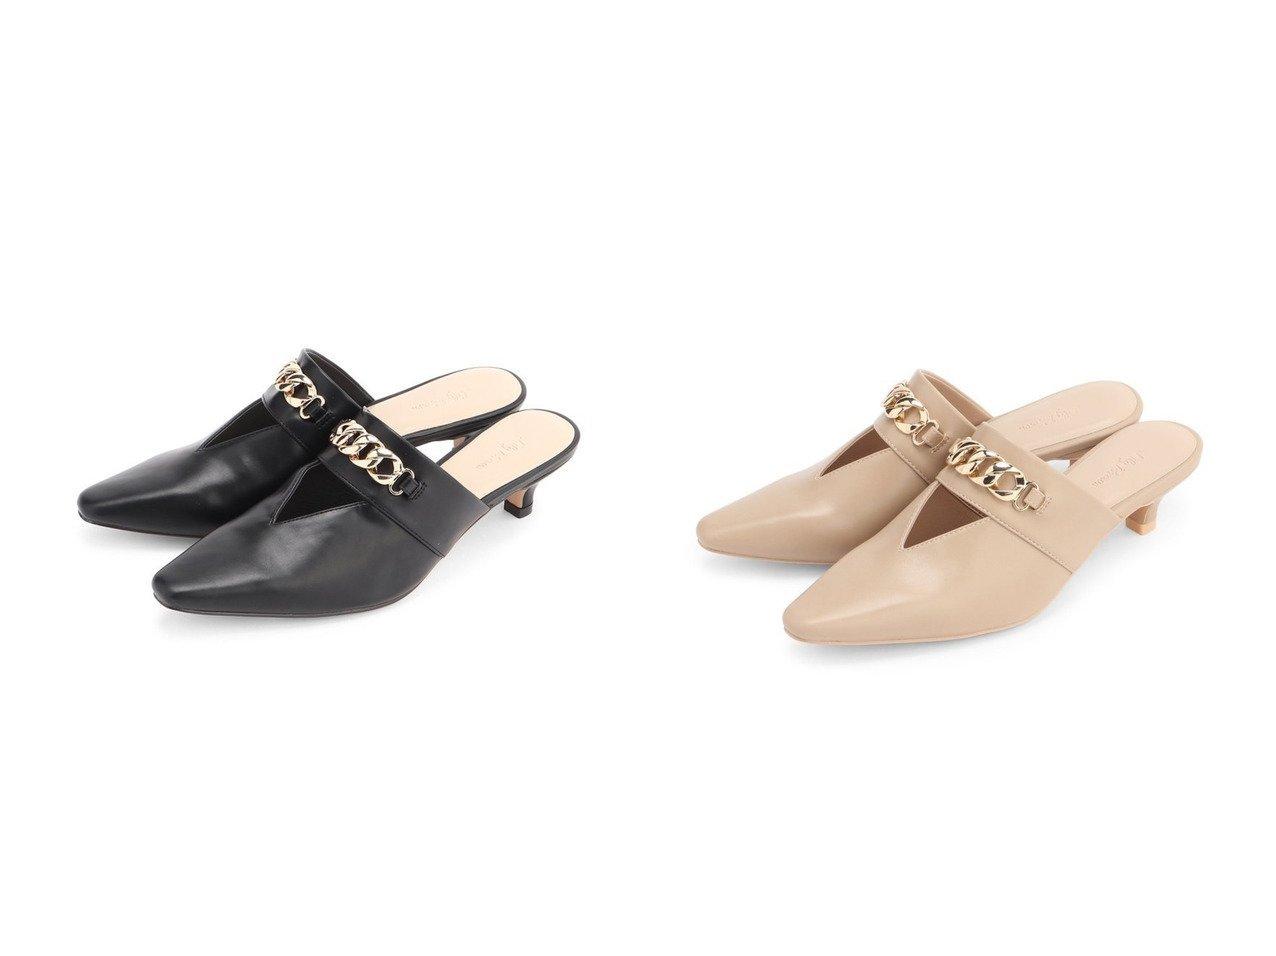 【Lily Brown/リリーブラウン】のチェーンポインテッドミュール シューズ・靴のおすすめ!人気、トレンド・レディースファッションの通販  おすすめで人気の流行・トレンド、ファッションの通販商品 メンズファッション・キッズファッション・インテリア・家具・レディースファッション・服の通販 founy(ファニー) https://founy.com/ ファッション Fashion レディースファッション WOMEN カッティング クール サンダル シューズ チェーン フェイクレザー ミュール |ID:crp329100000009854